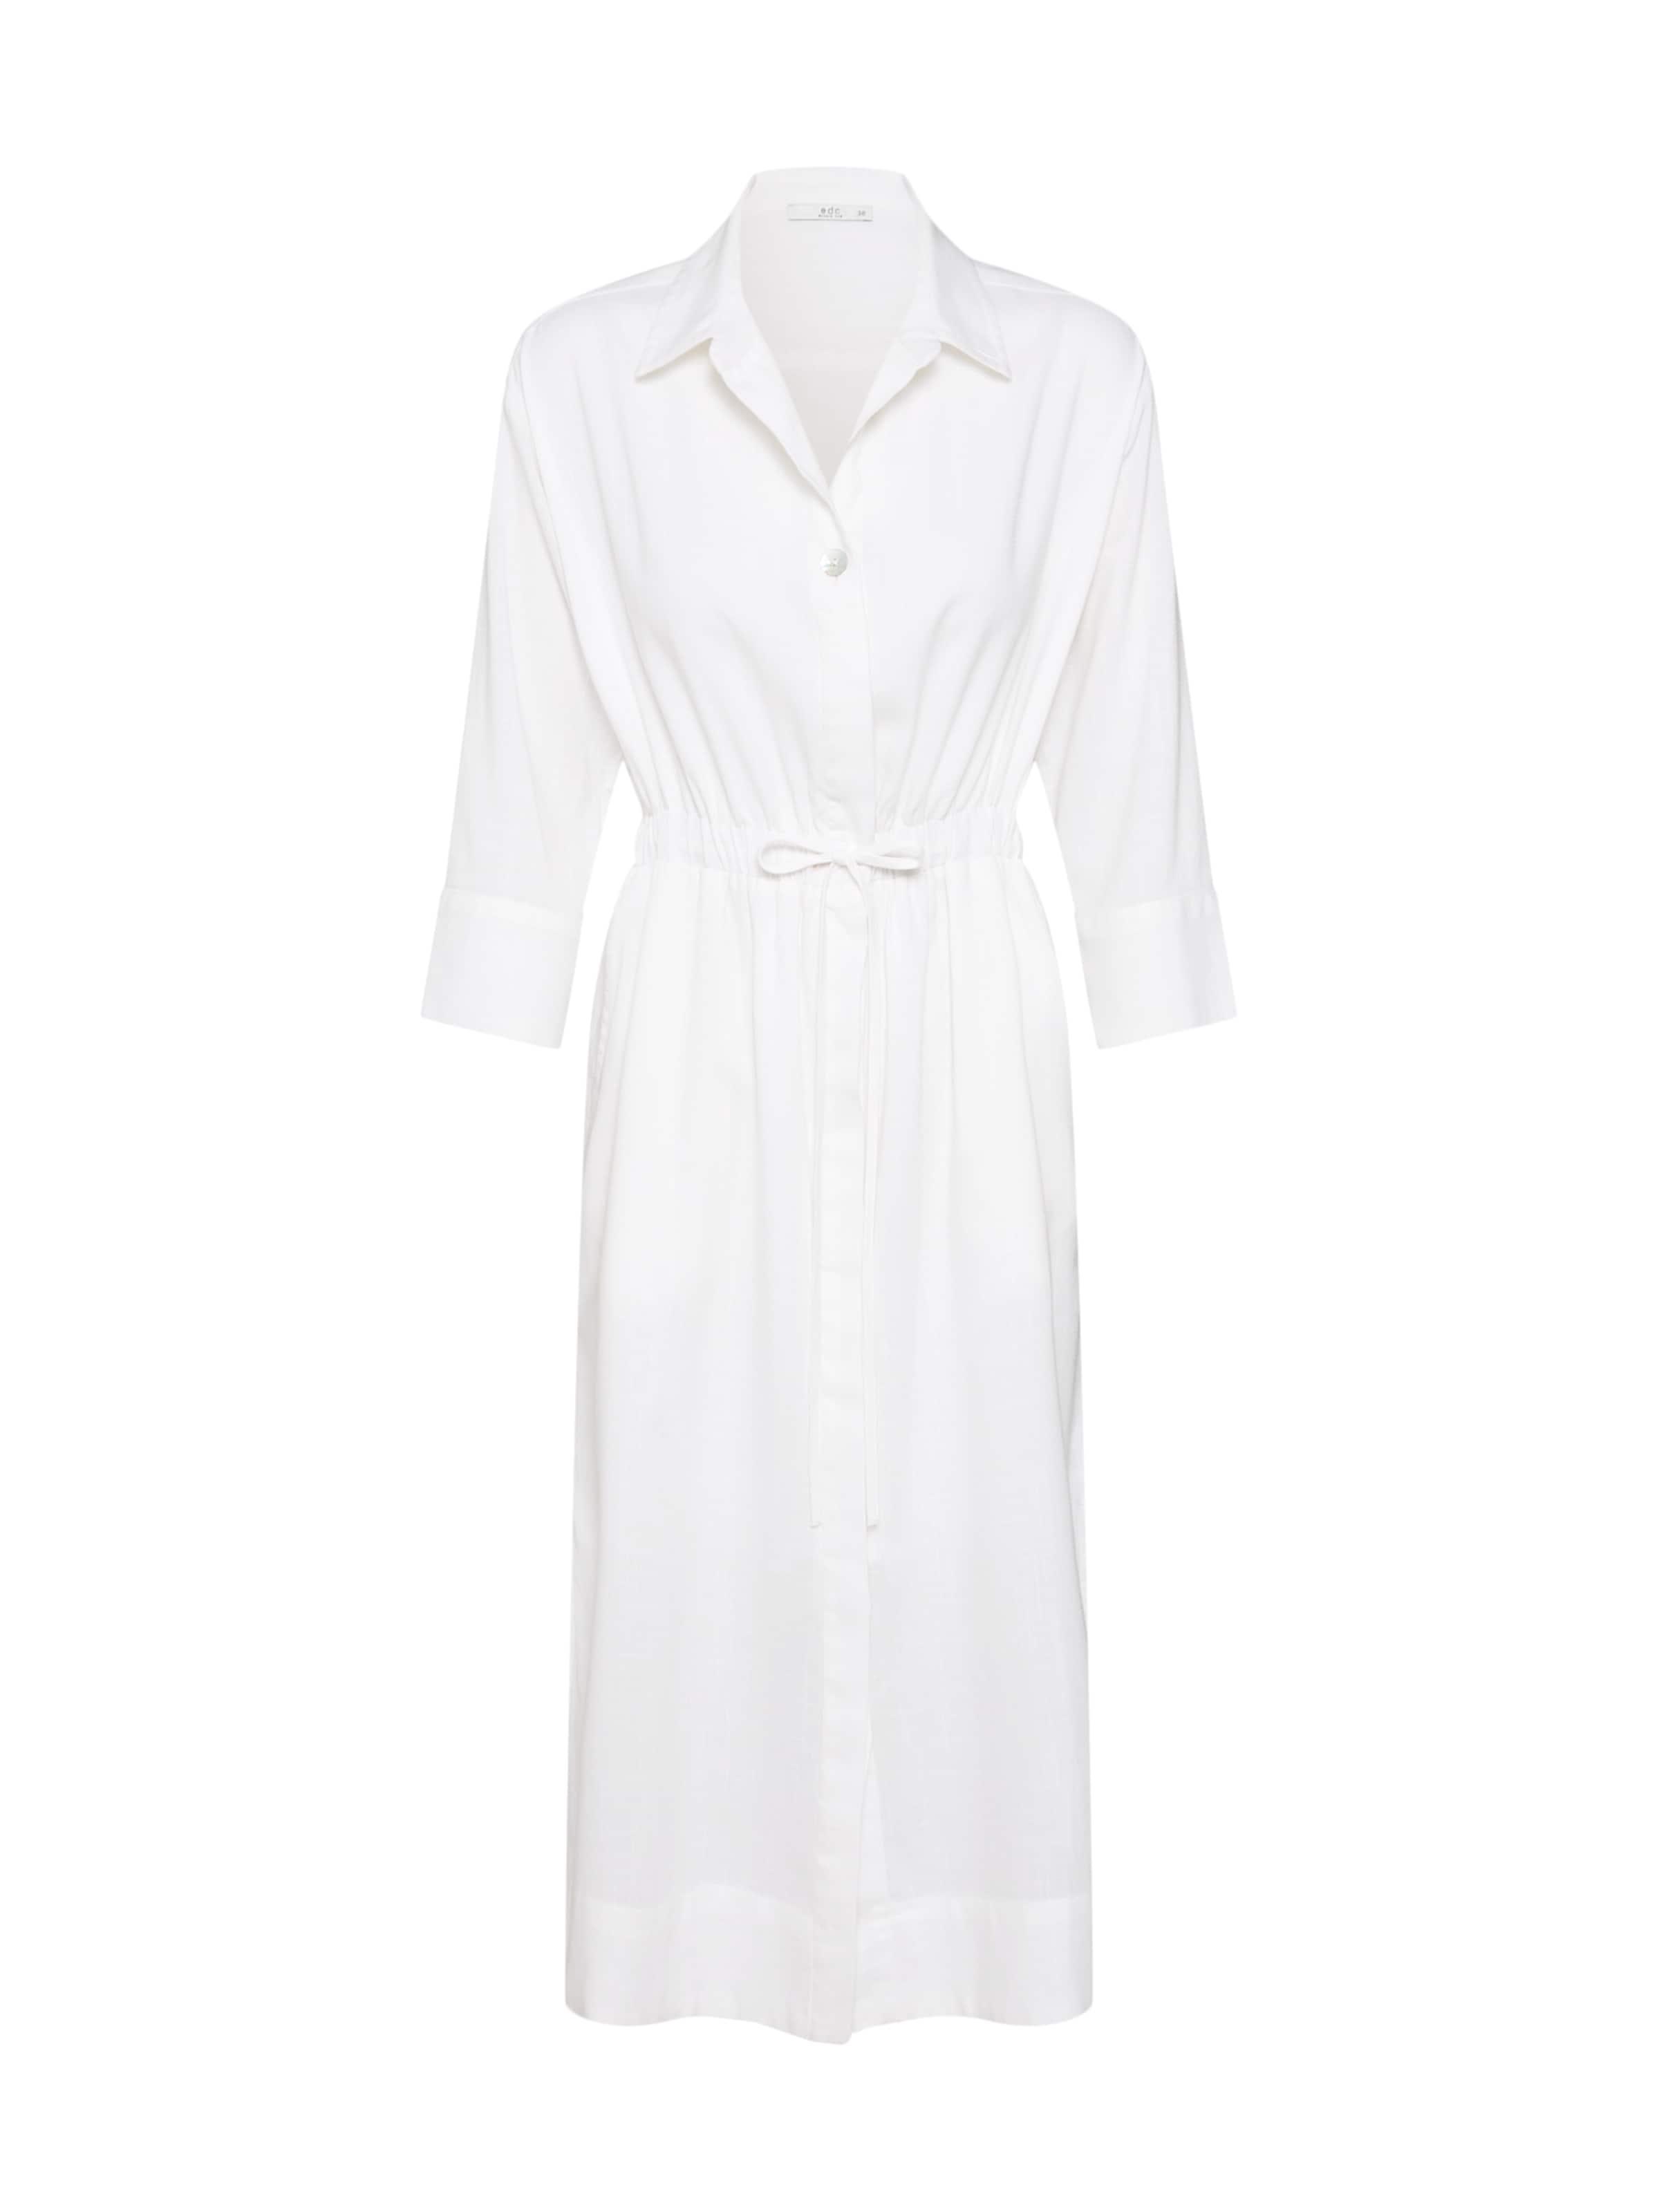 Edc Esprit Robe chemise En Blanc By CxoedB